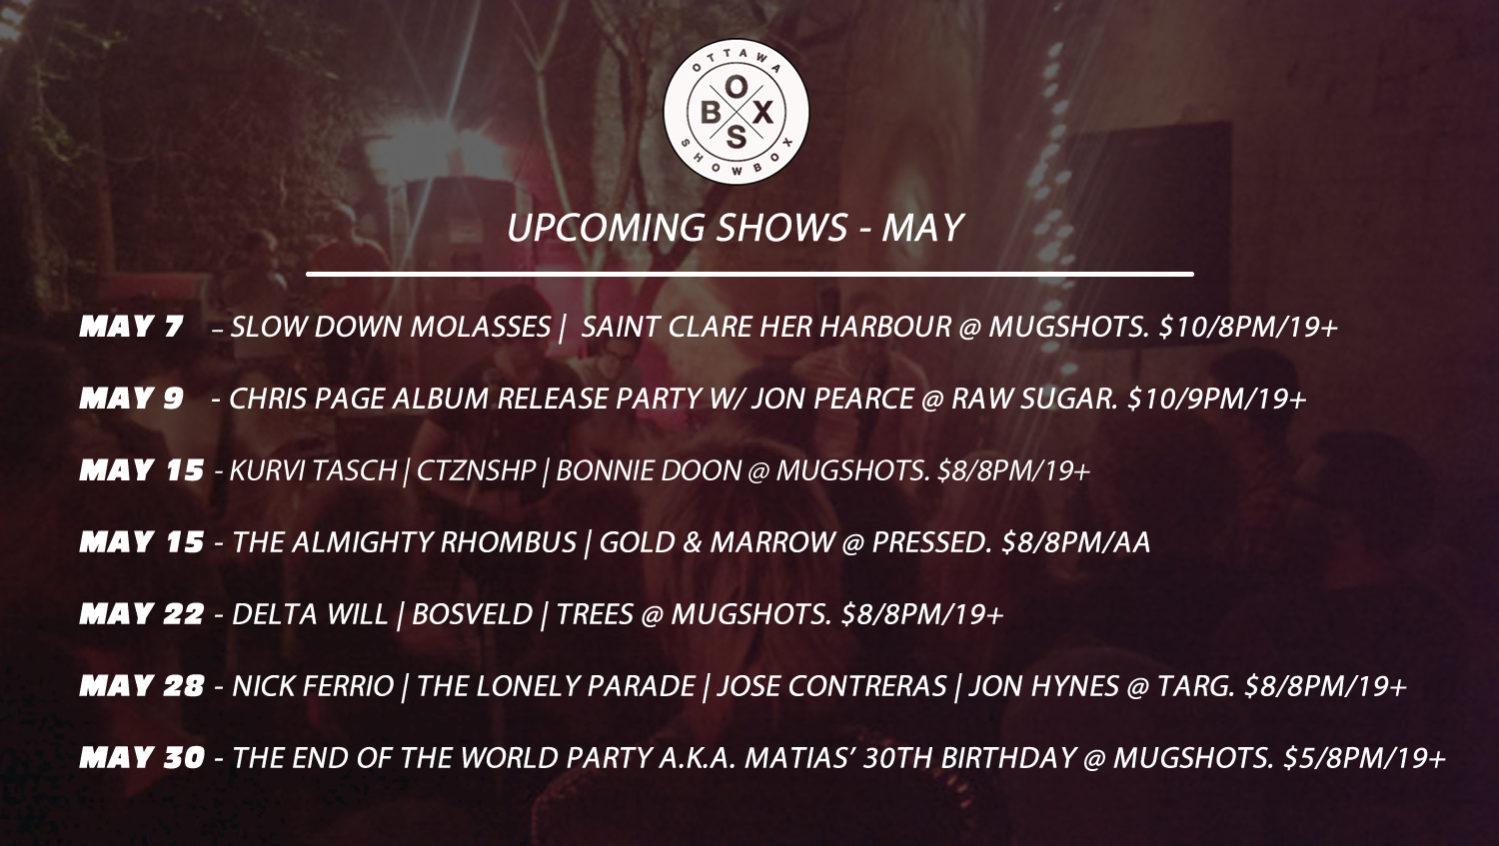 MayShows3